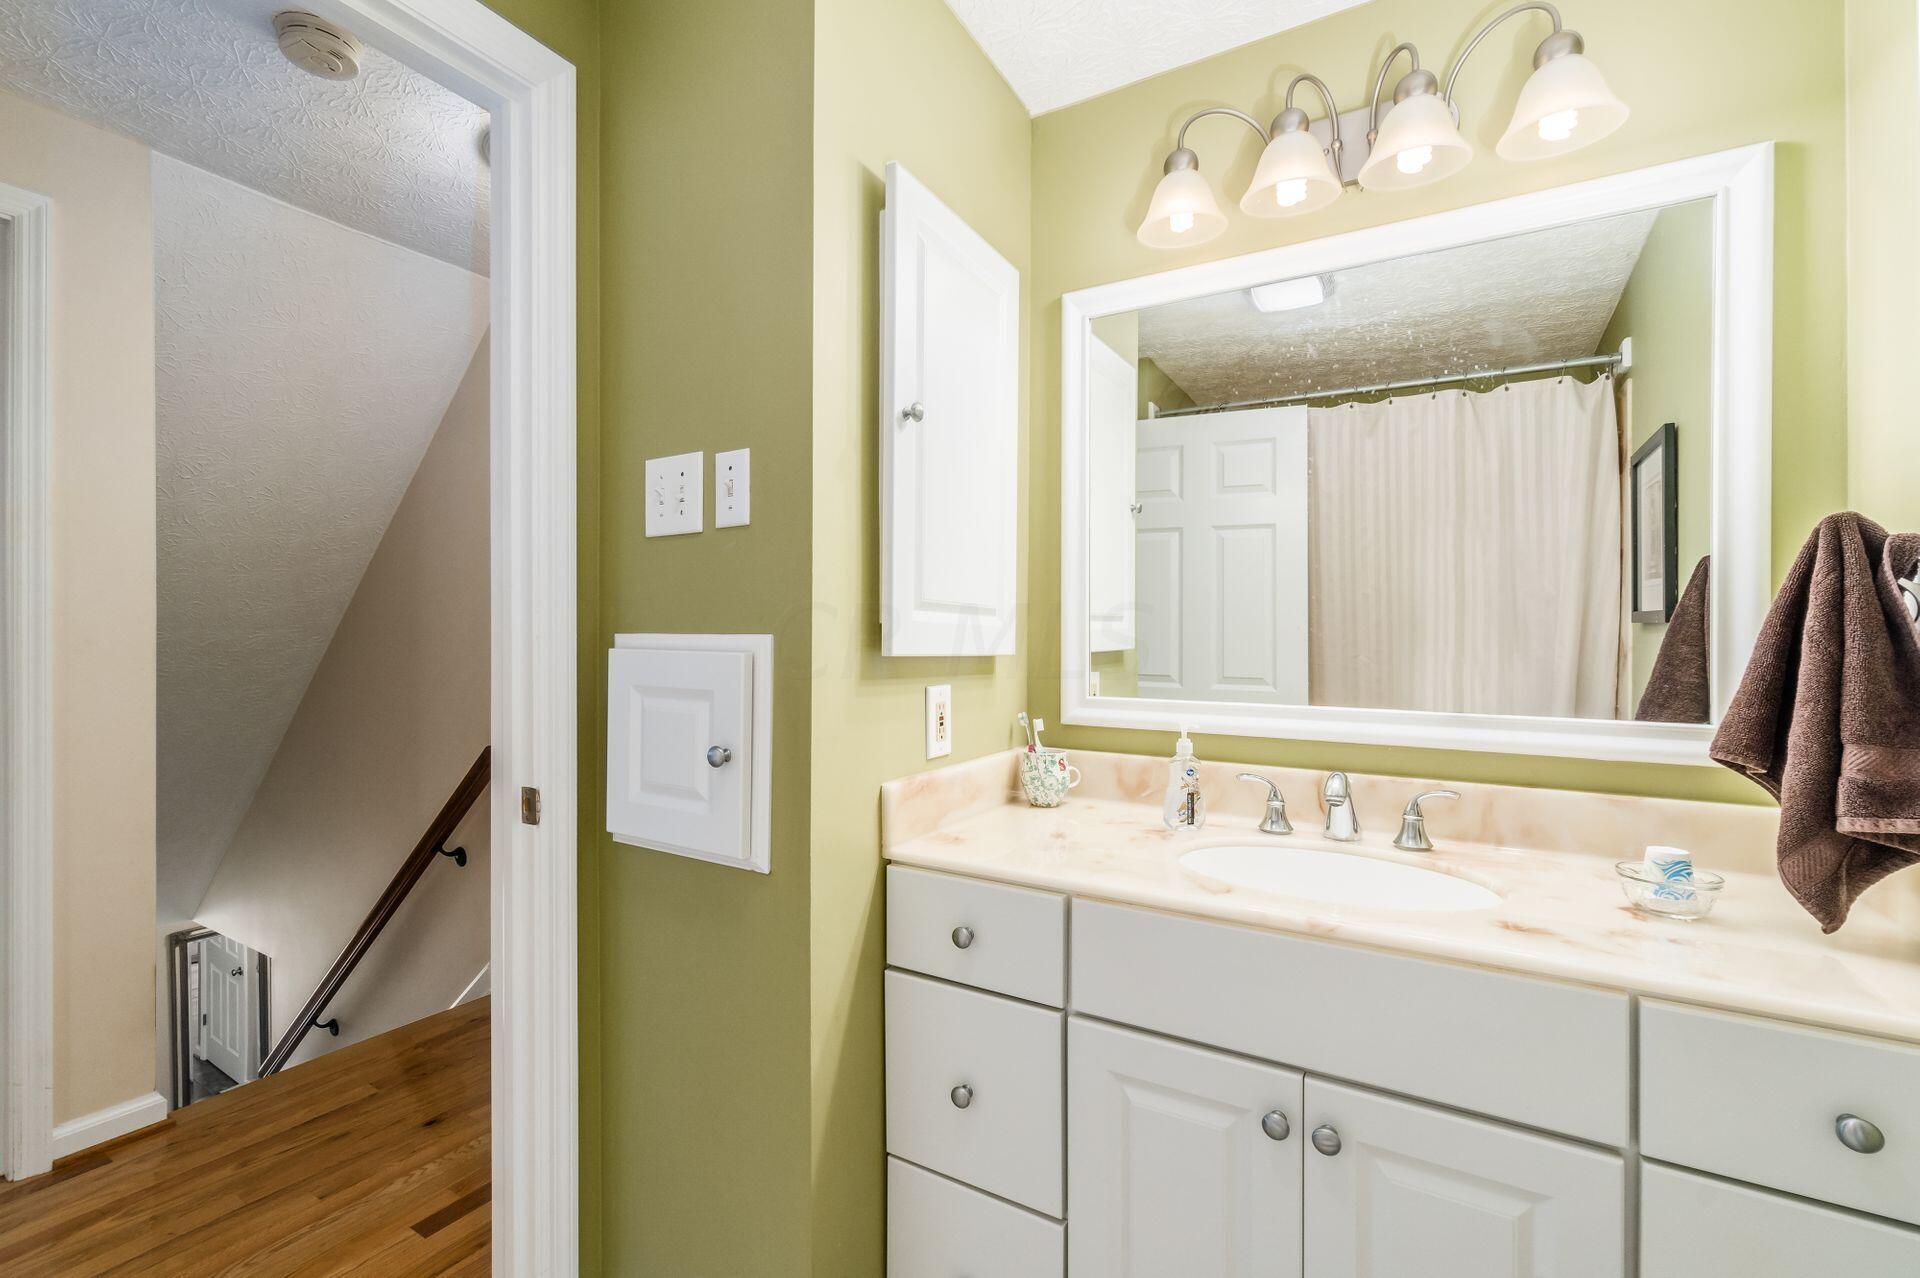 Stylish Vanity & Soaking Tub